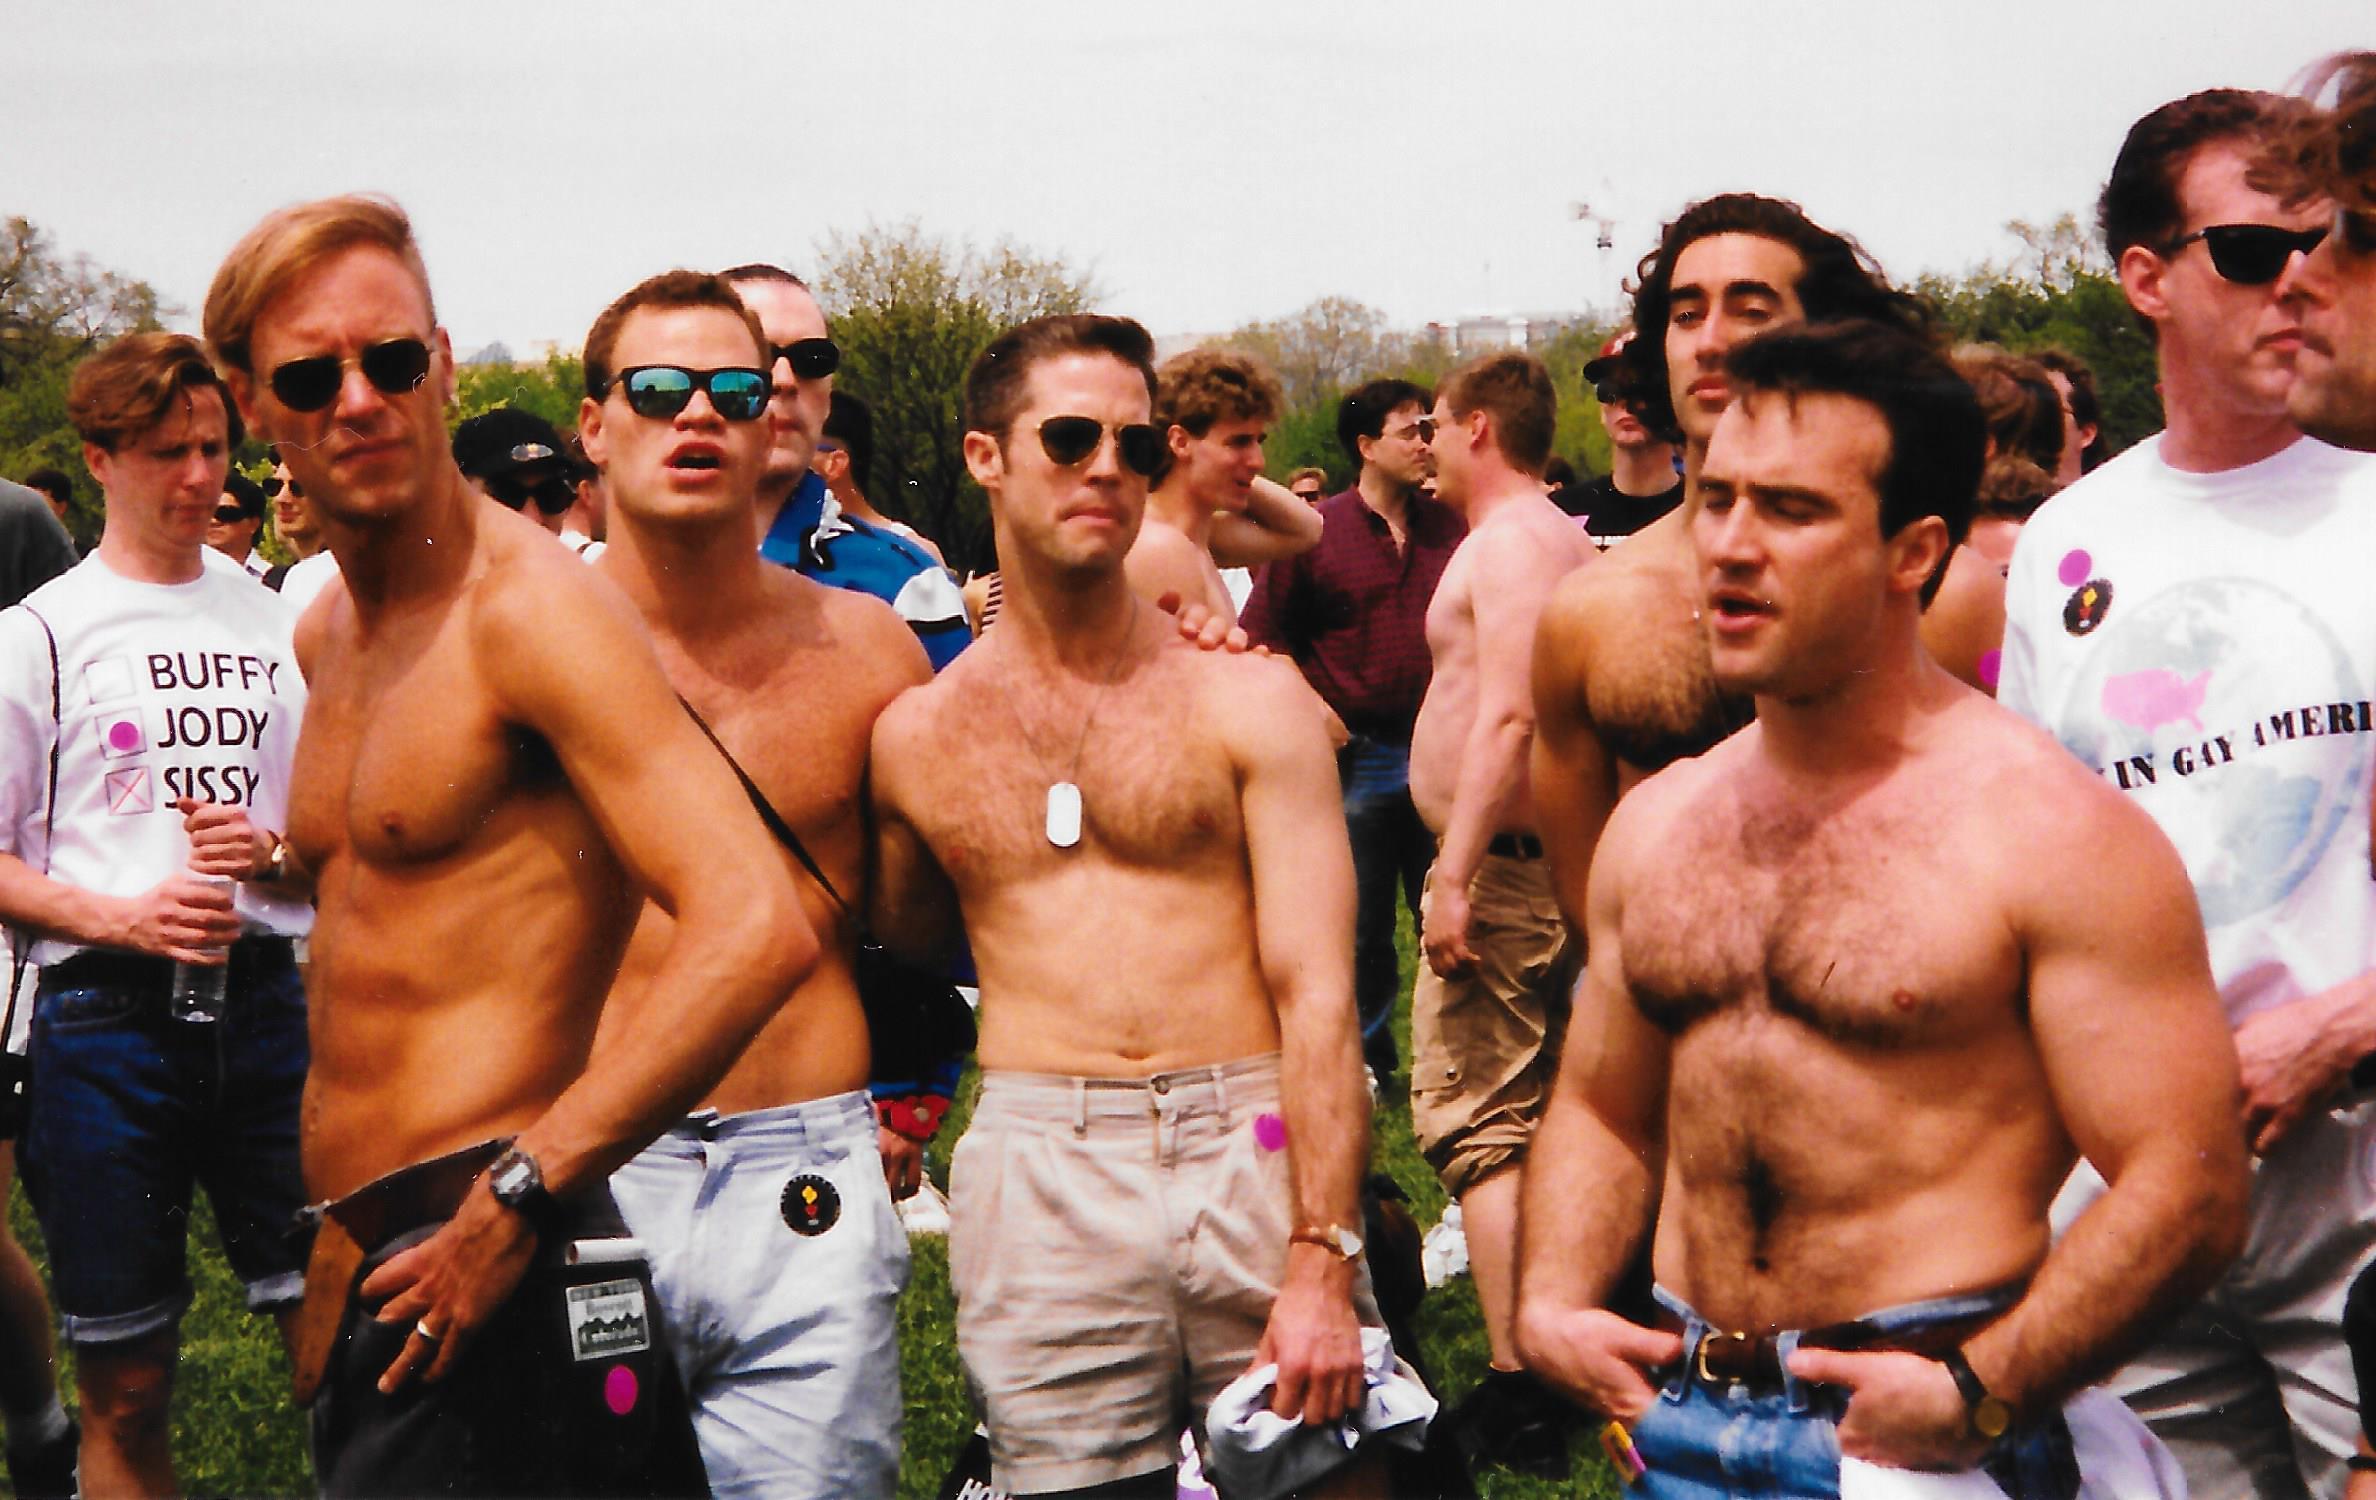 1993 March on Washington - Damon Mackert, Marty Sarussi, Greg Walter, Seth Hoff, Steve Knox, Dick O'Brien